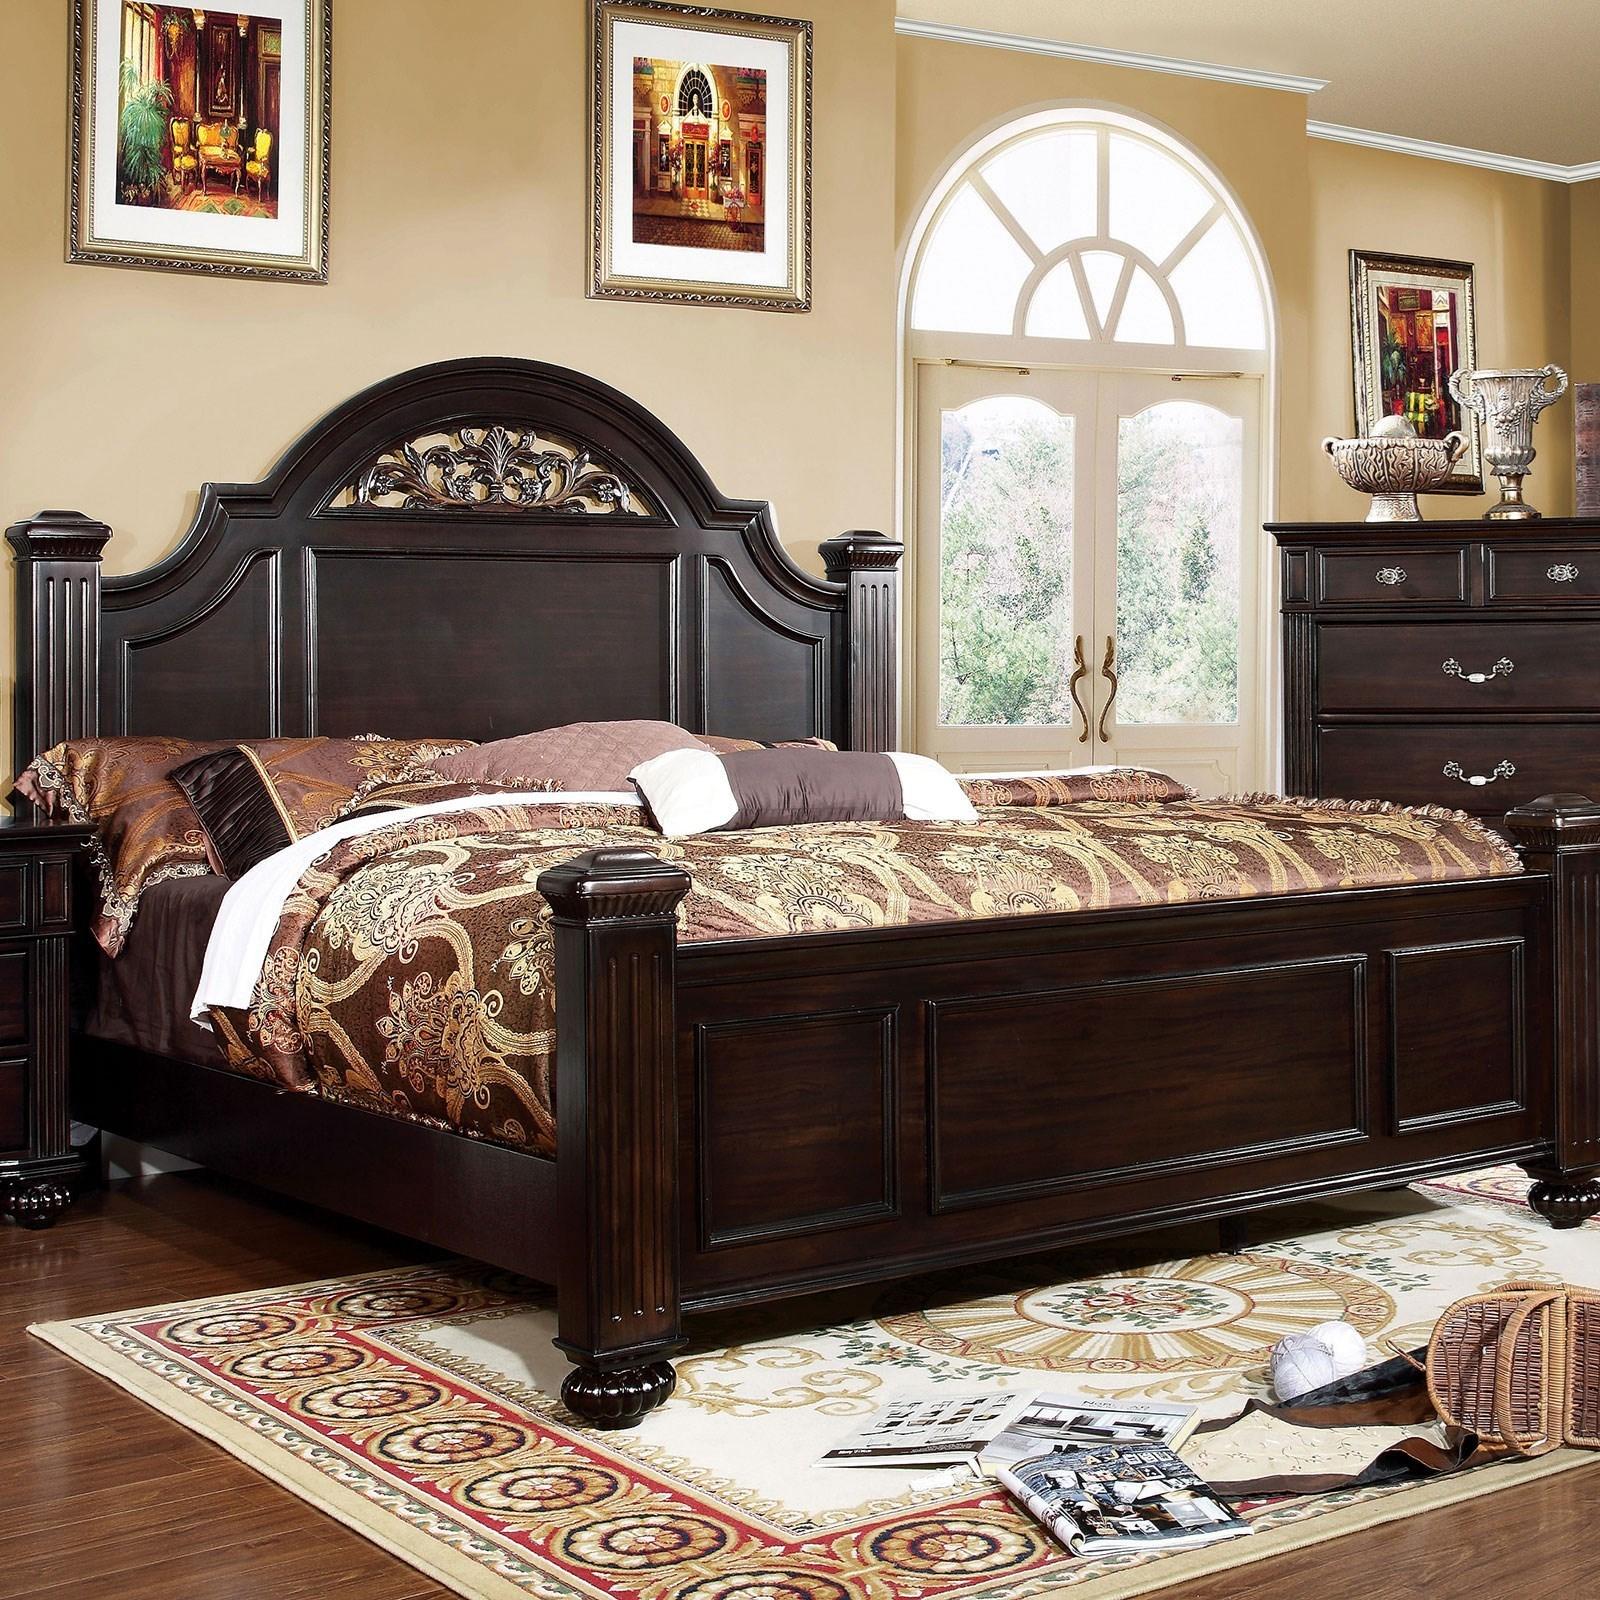 syracuse california king bed